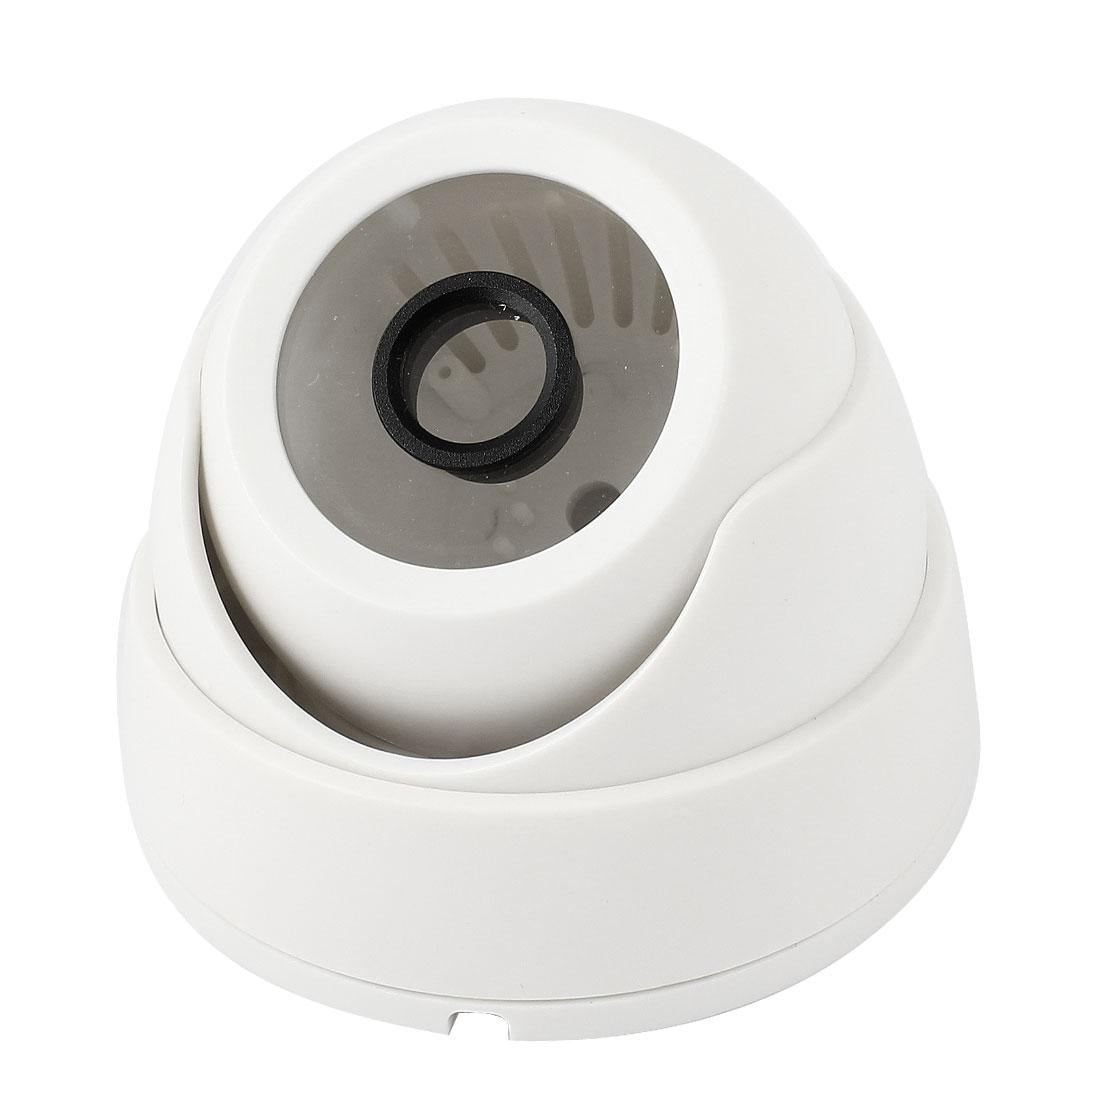 "Surveillance White Plastic CCTV Dome Camera Housing Case 3.7"" Dia"